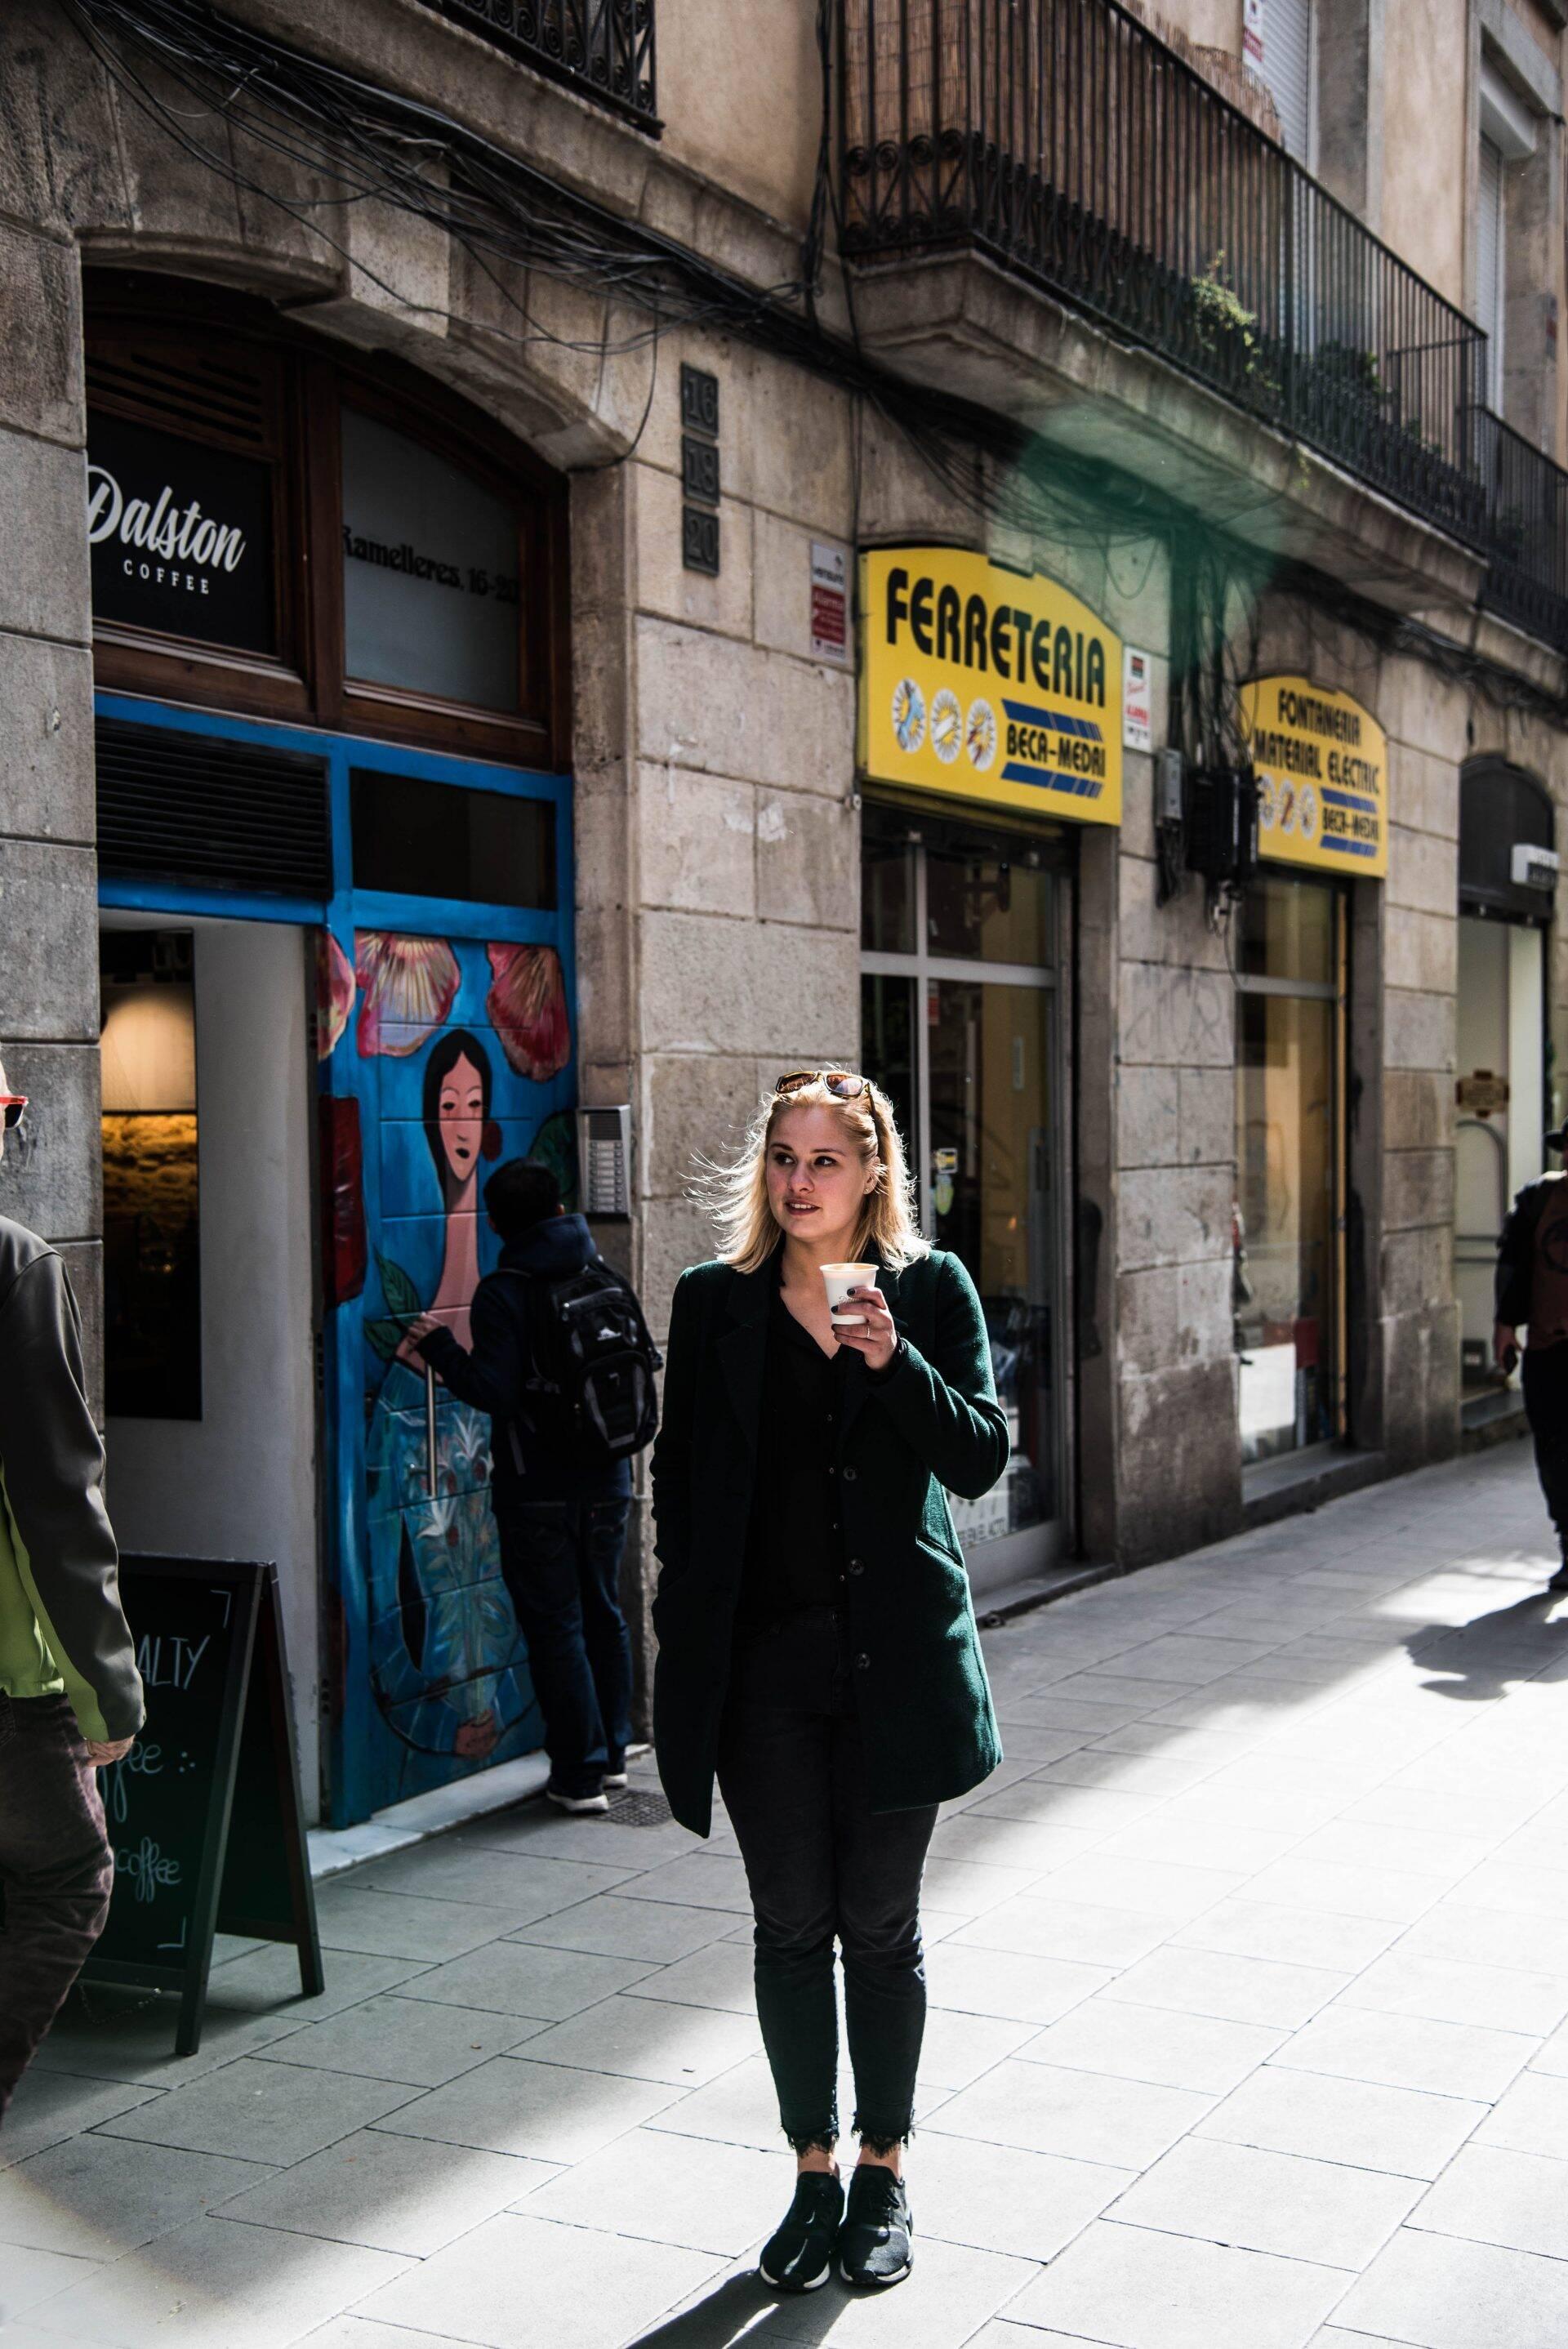 Dalston Coffee in Barcelona